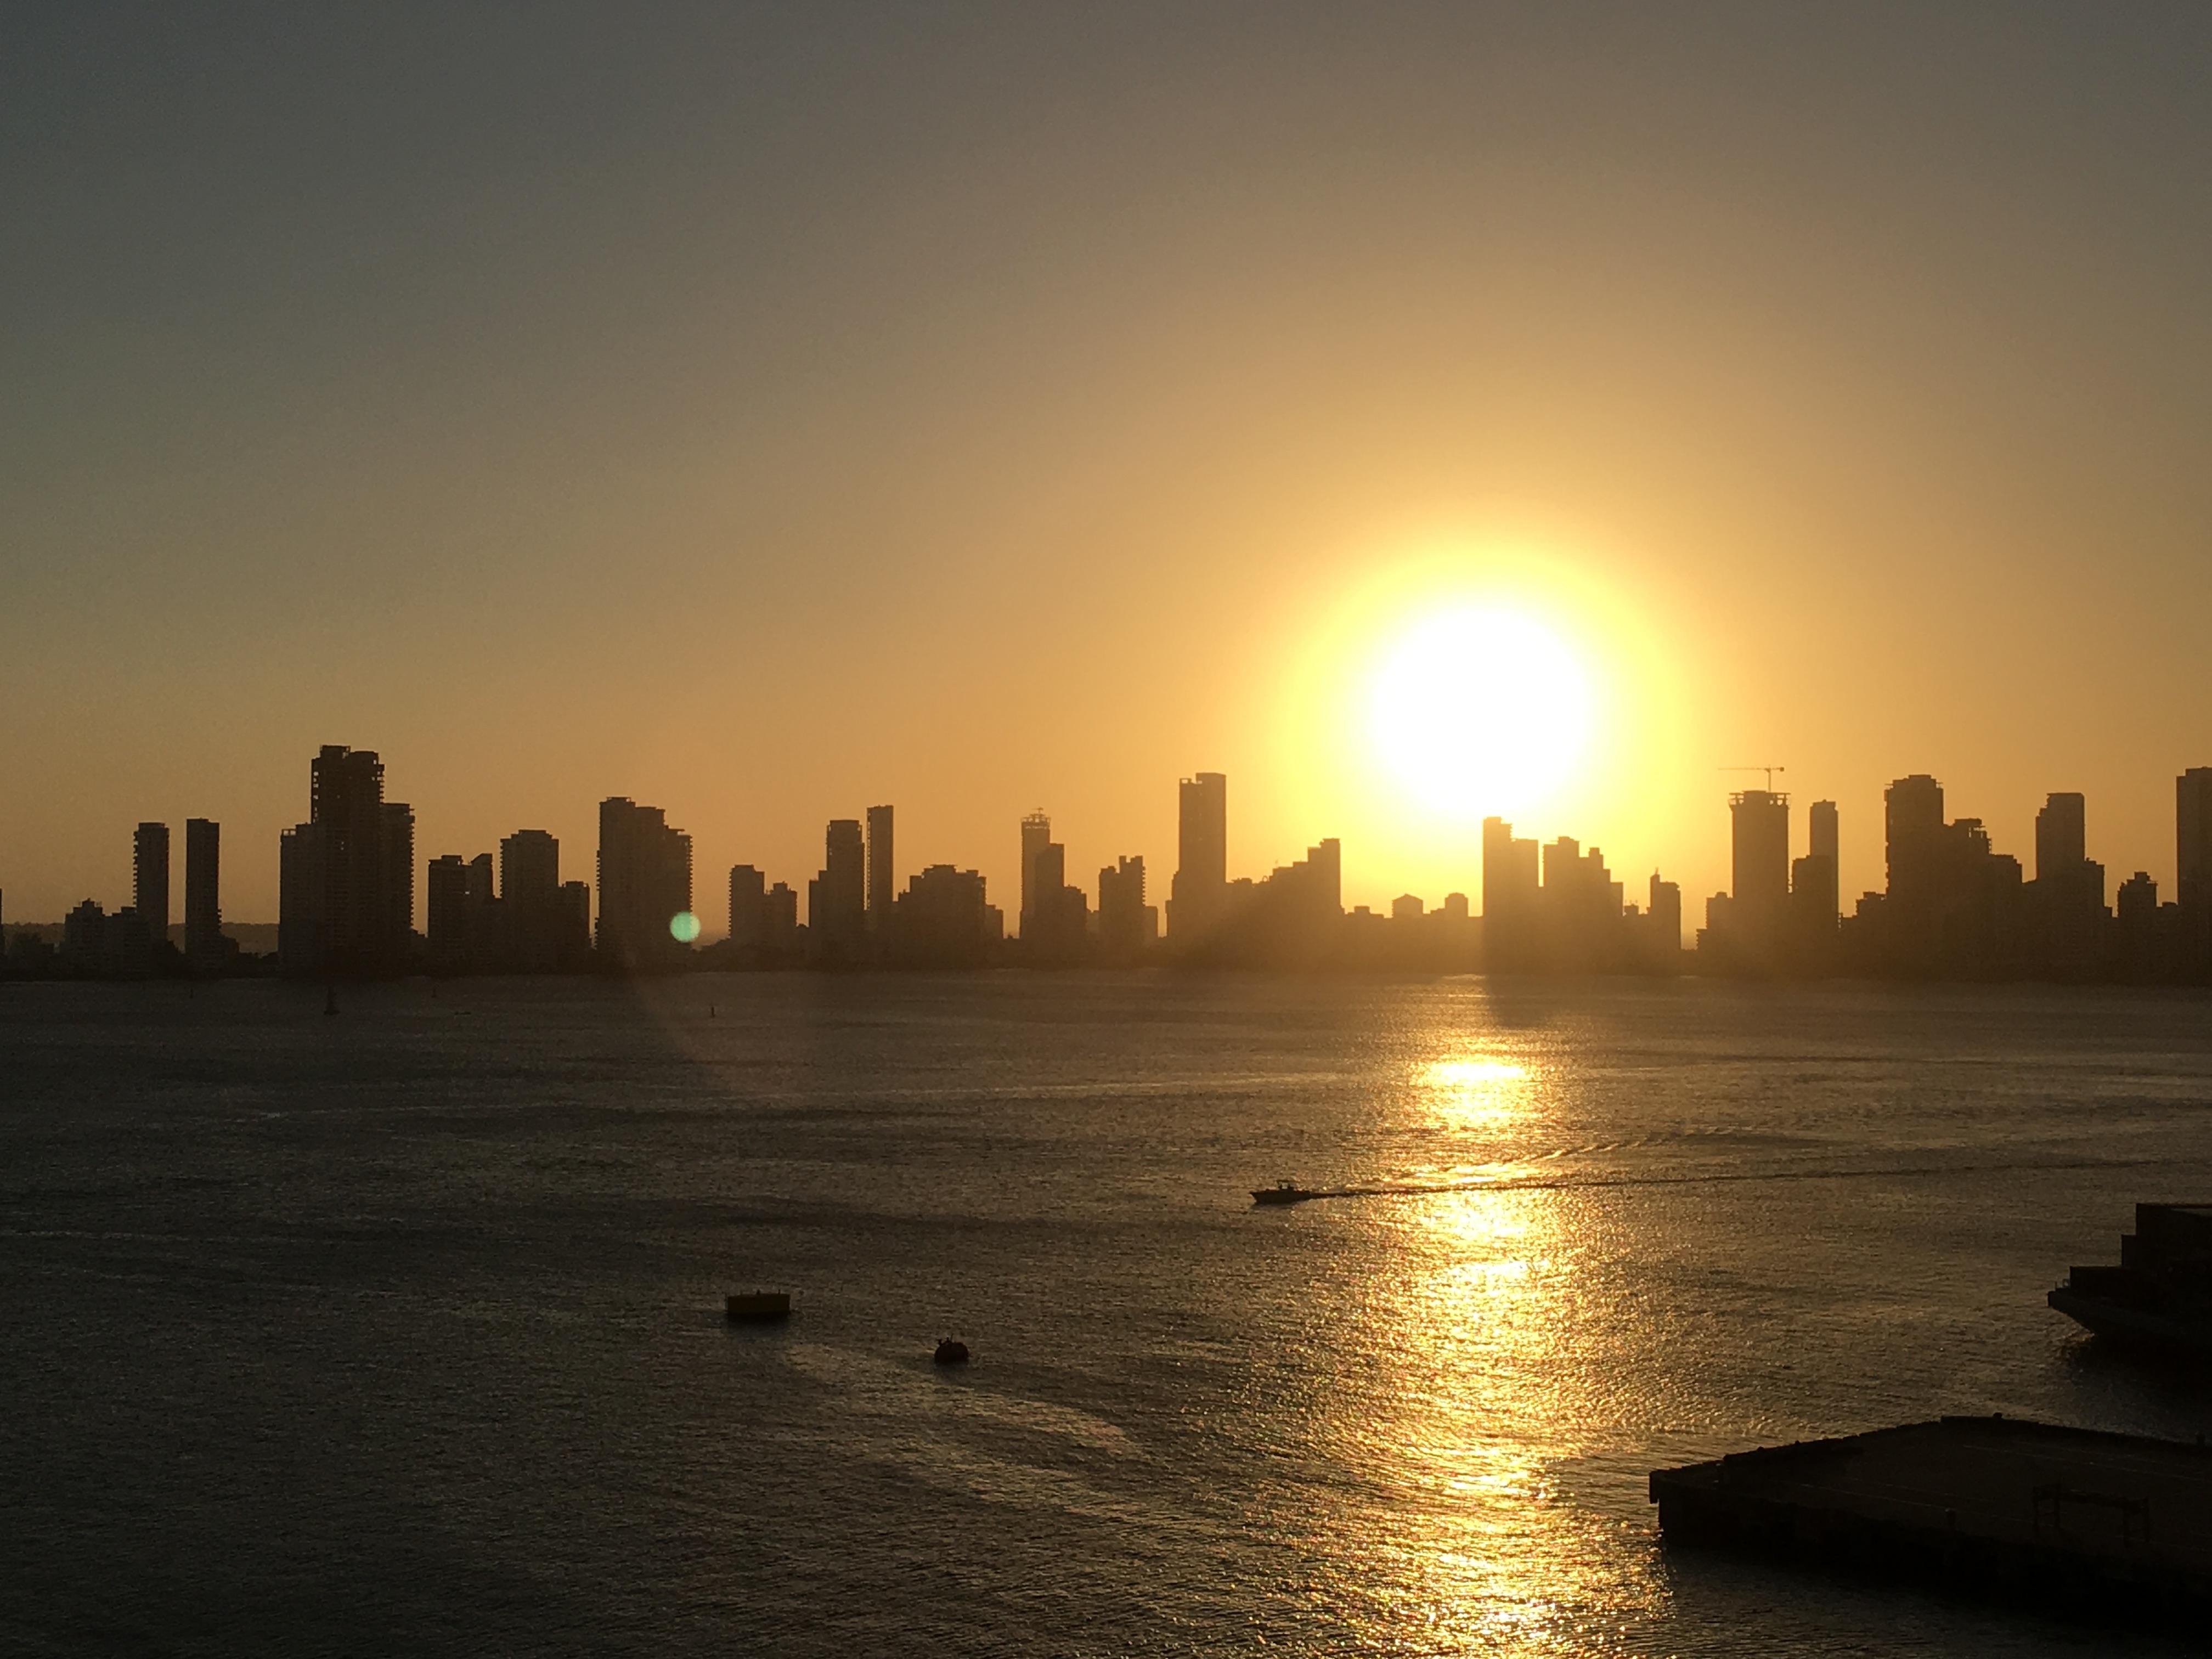 Sonnenuntergang über Cartagenas Skyline in Kolumbien